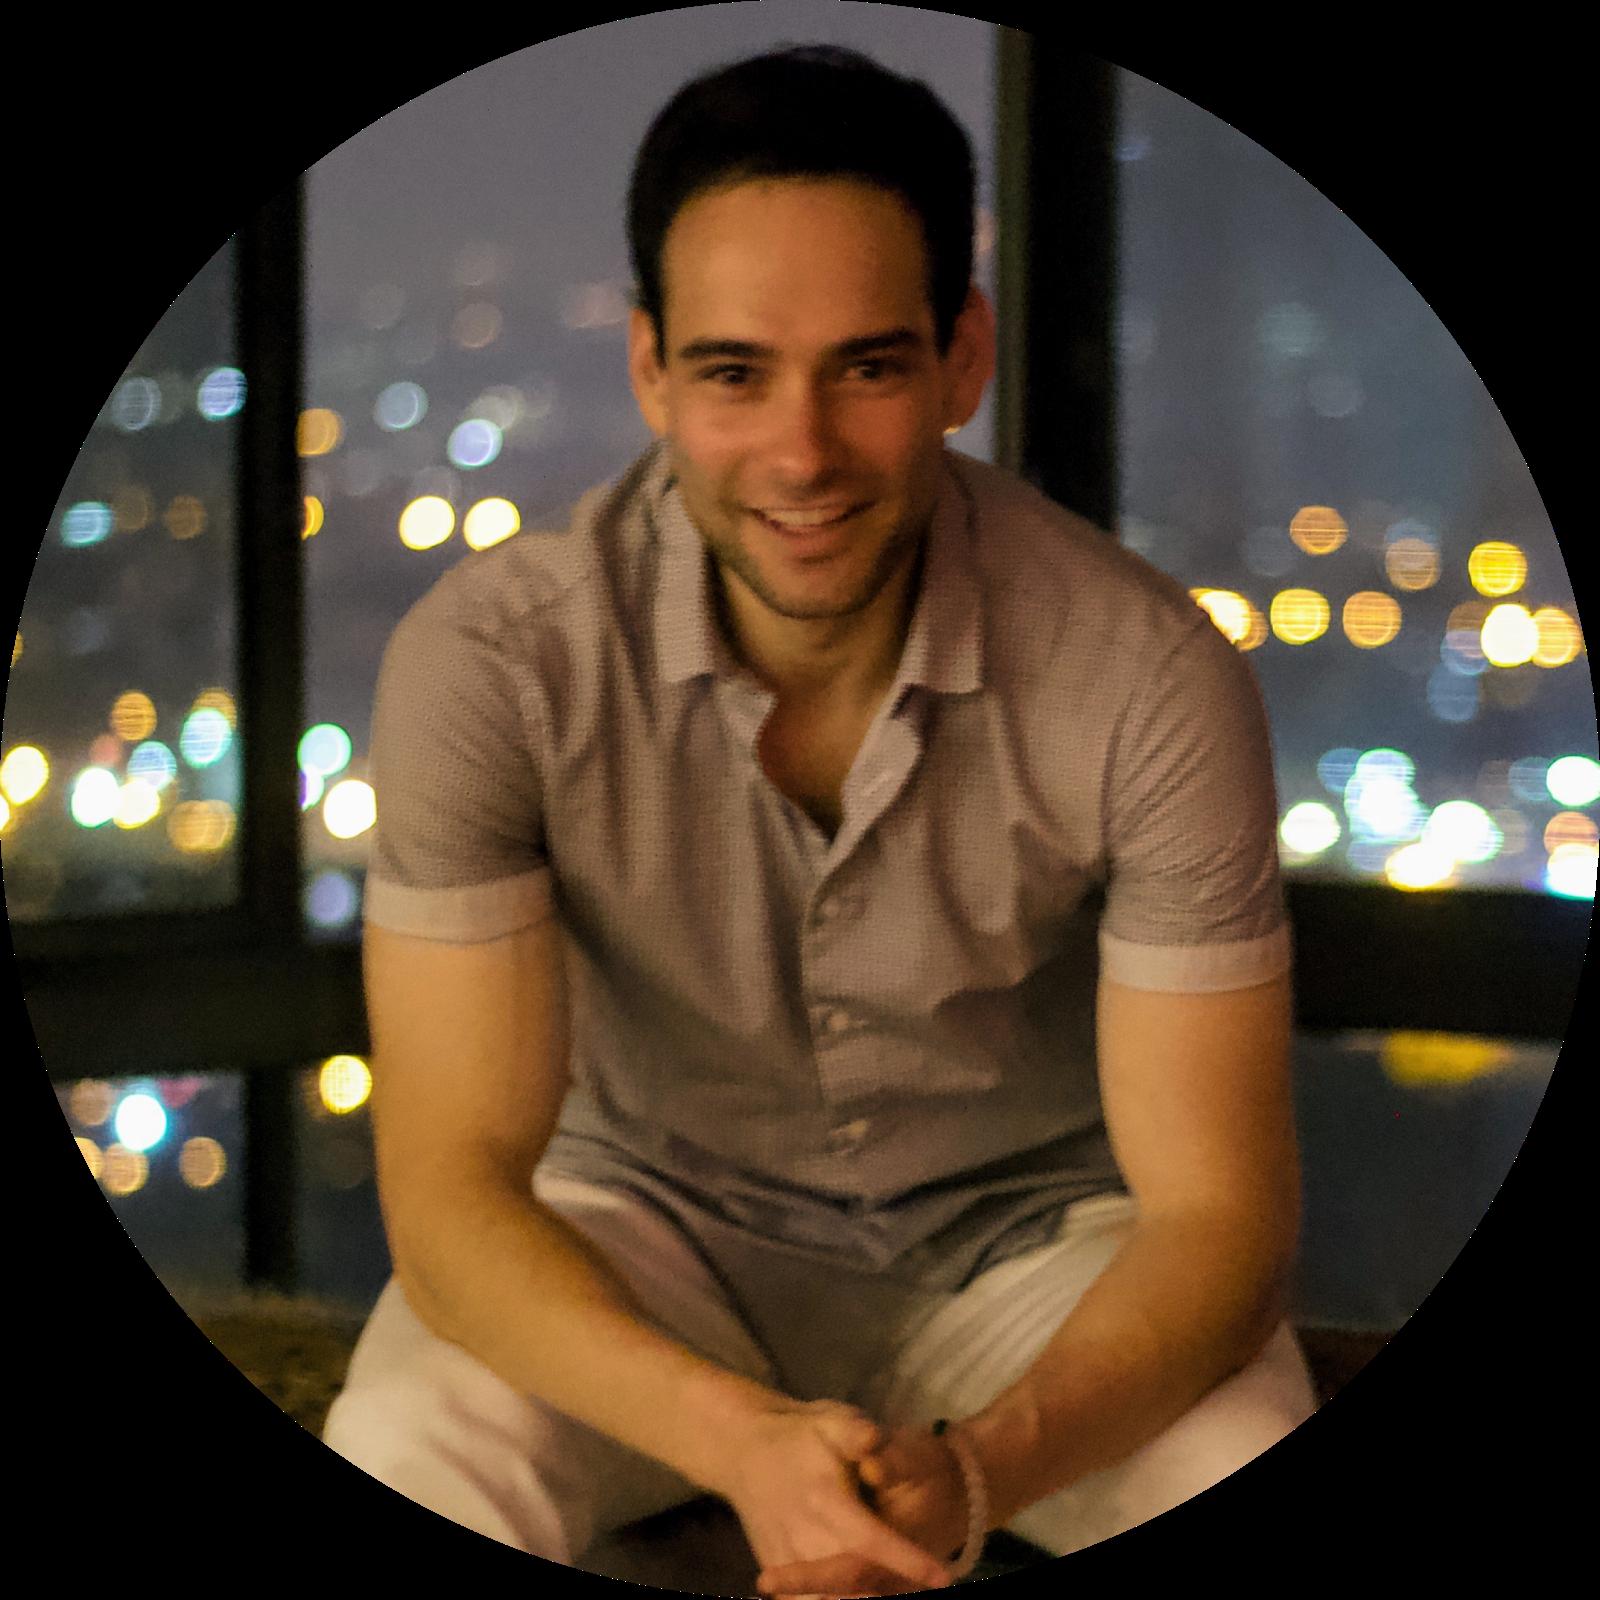 https://dashup.firebaseapp.com/adam-logo.png